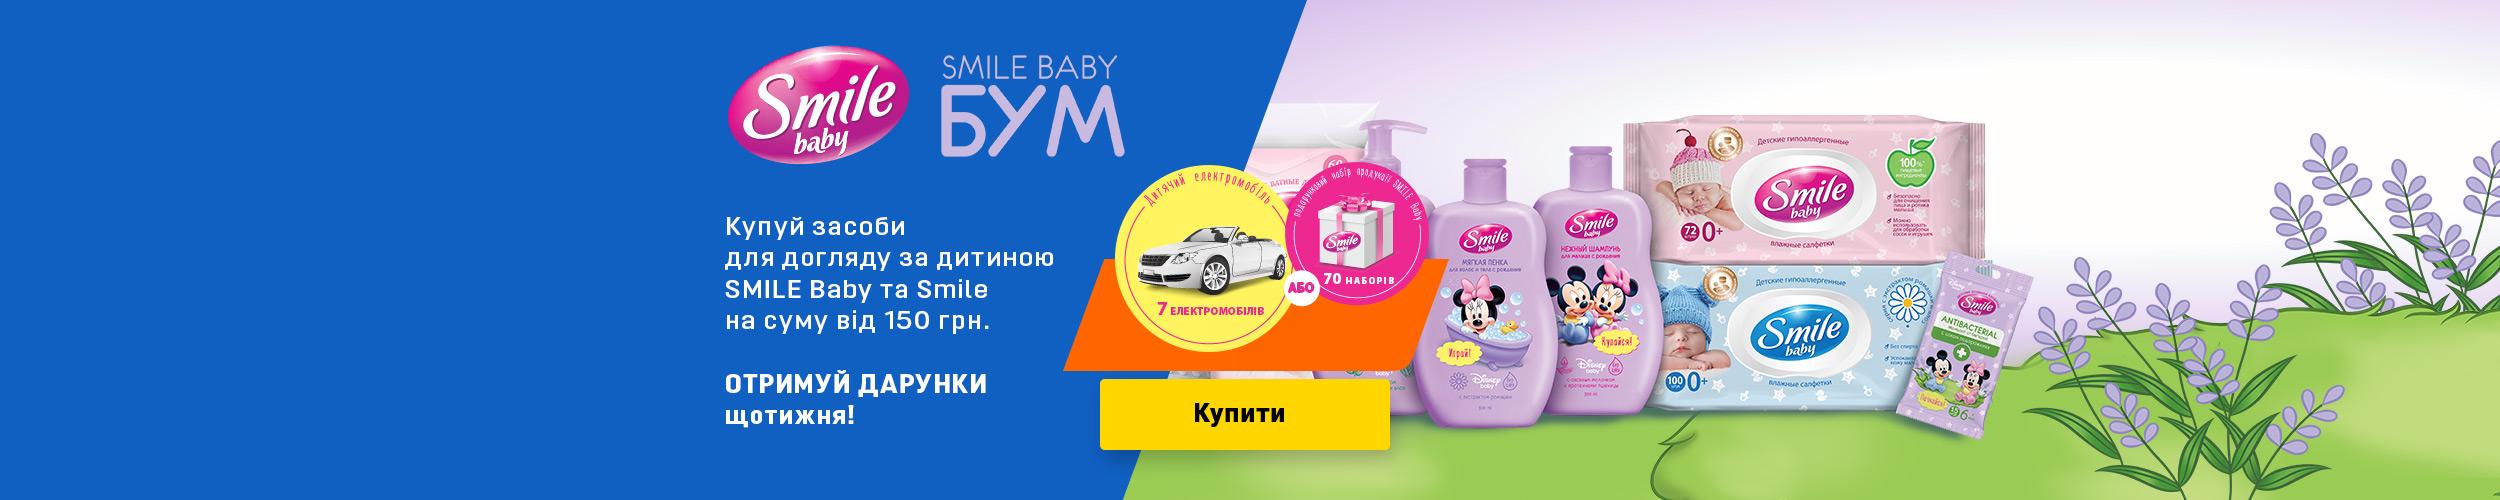 ᐉ Засоби по догляду за тілом в Києві купити • 2️⃣7️⃣UA Україна ... e992c865d019d